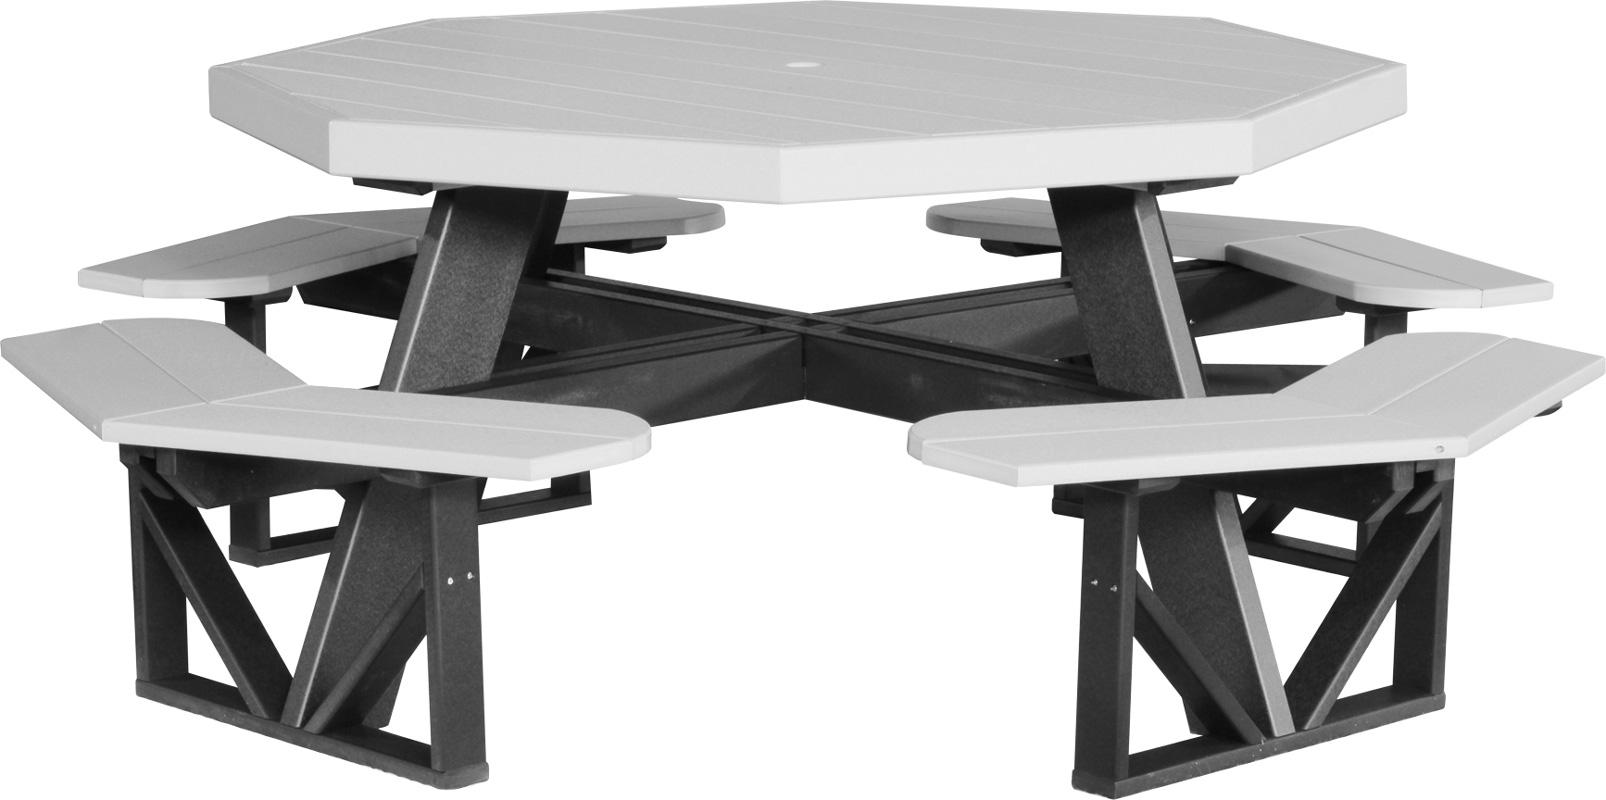 Octagonal Poly Picnic Table Ohio Hardwood Furniture